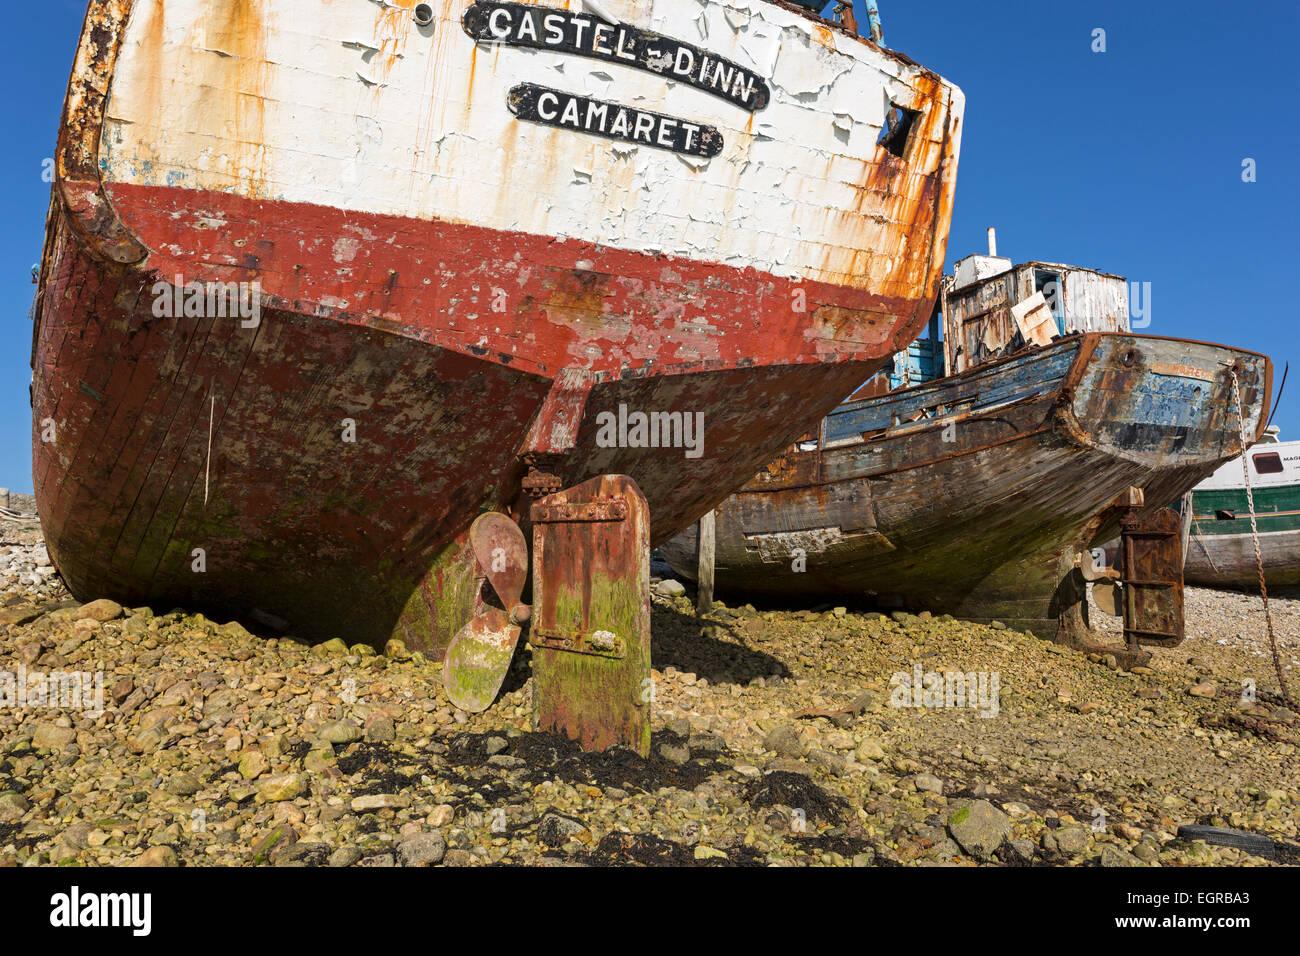 Wreck of an old fishing boat, ship graveyard, Camaret-sur-Mer, Département Finistère, Brittany, France, - Stock Image